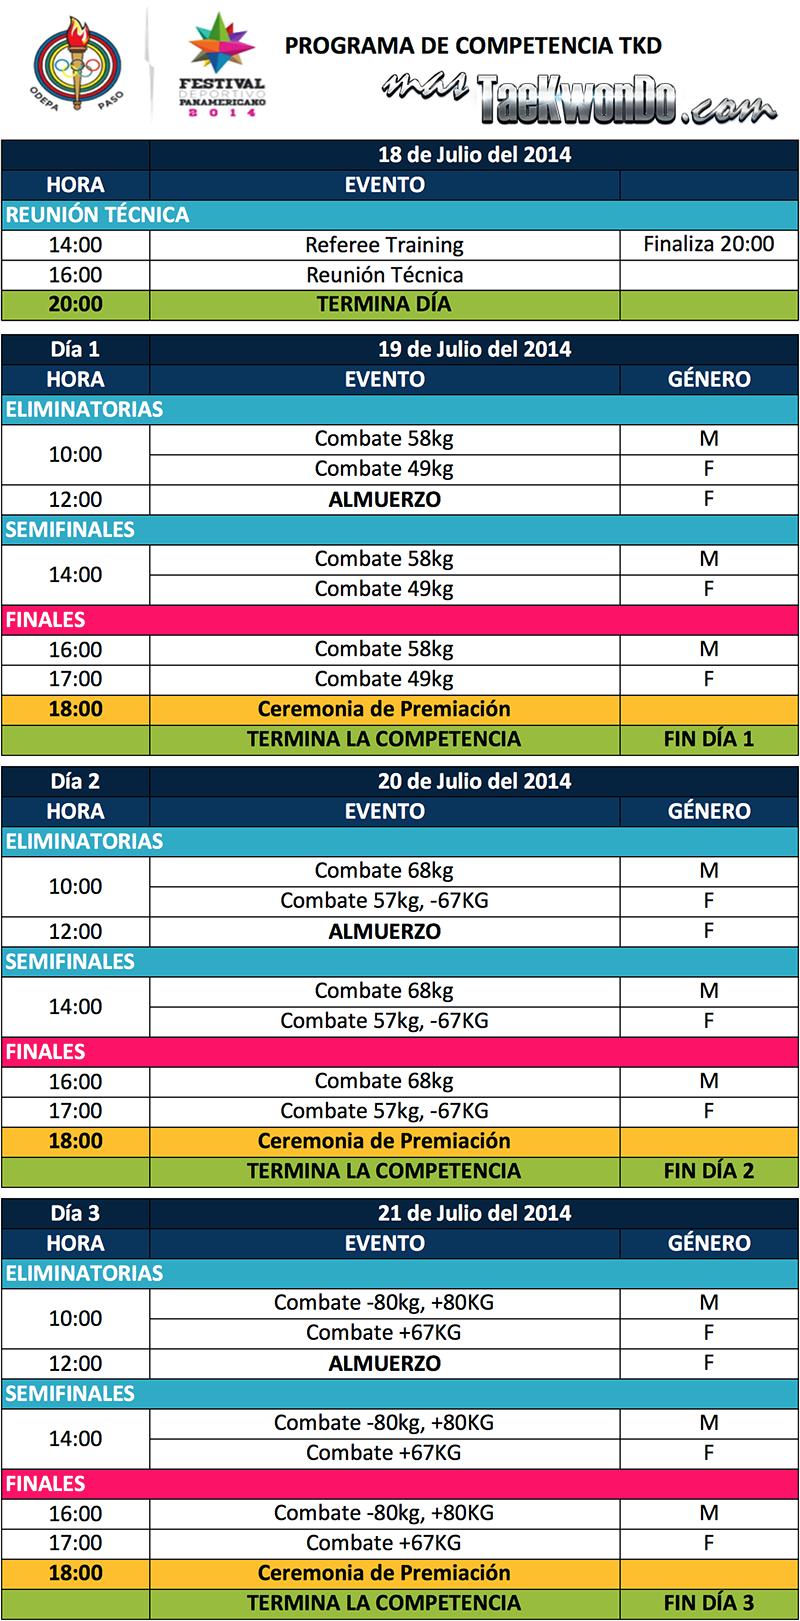 Cronograma del Festival Olímpico Deportivo Panamericano de Taekwondo